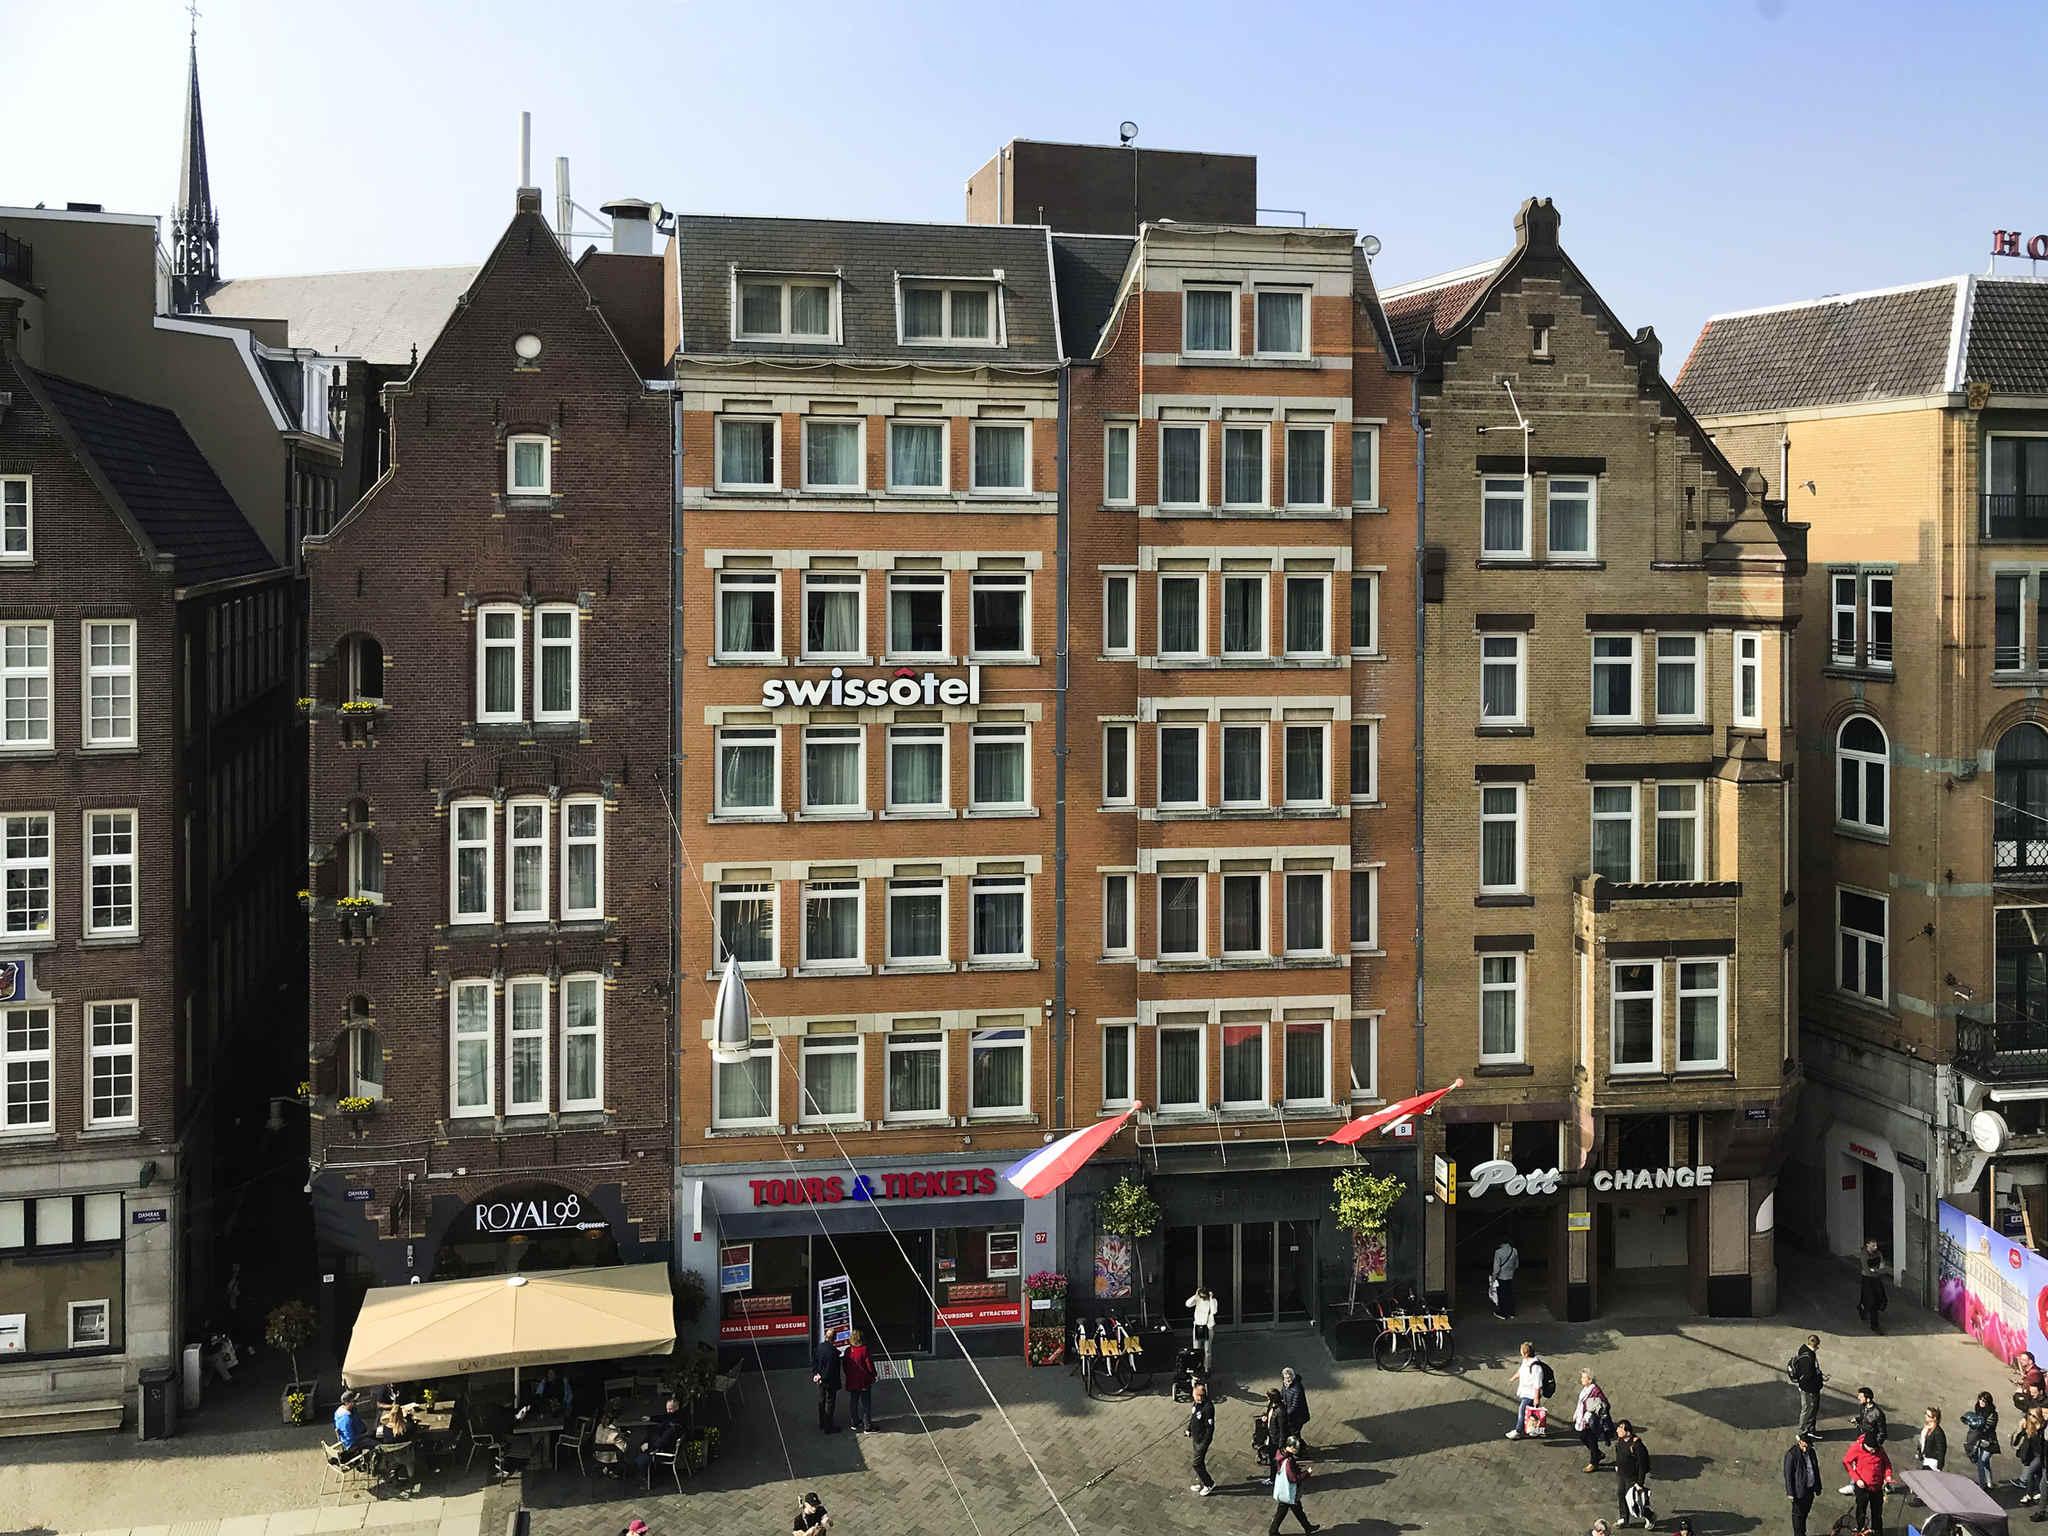 فندق - سويسوتيل أمستردام